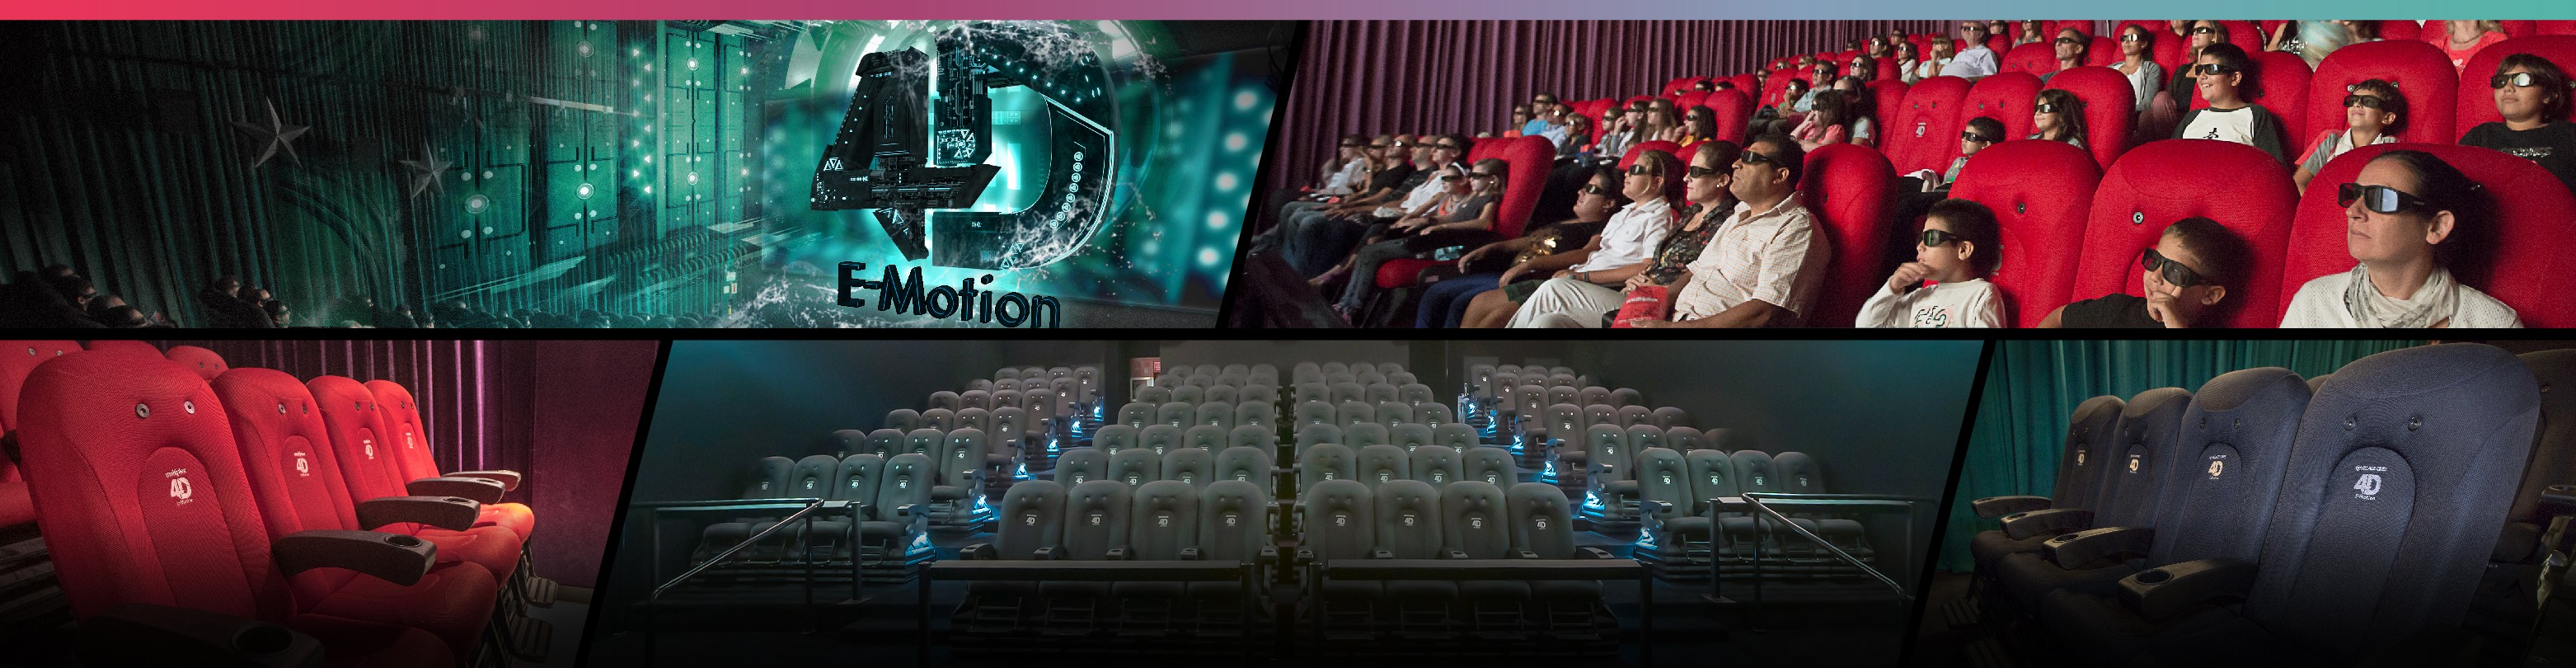 LUMMA · 4D E-Motion | LinkedIn